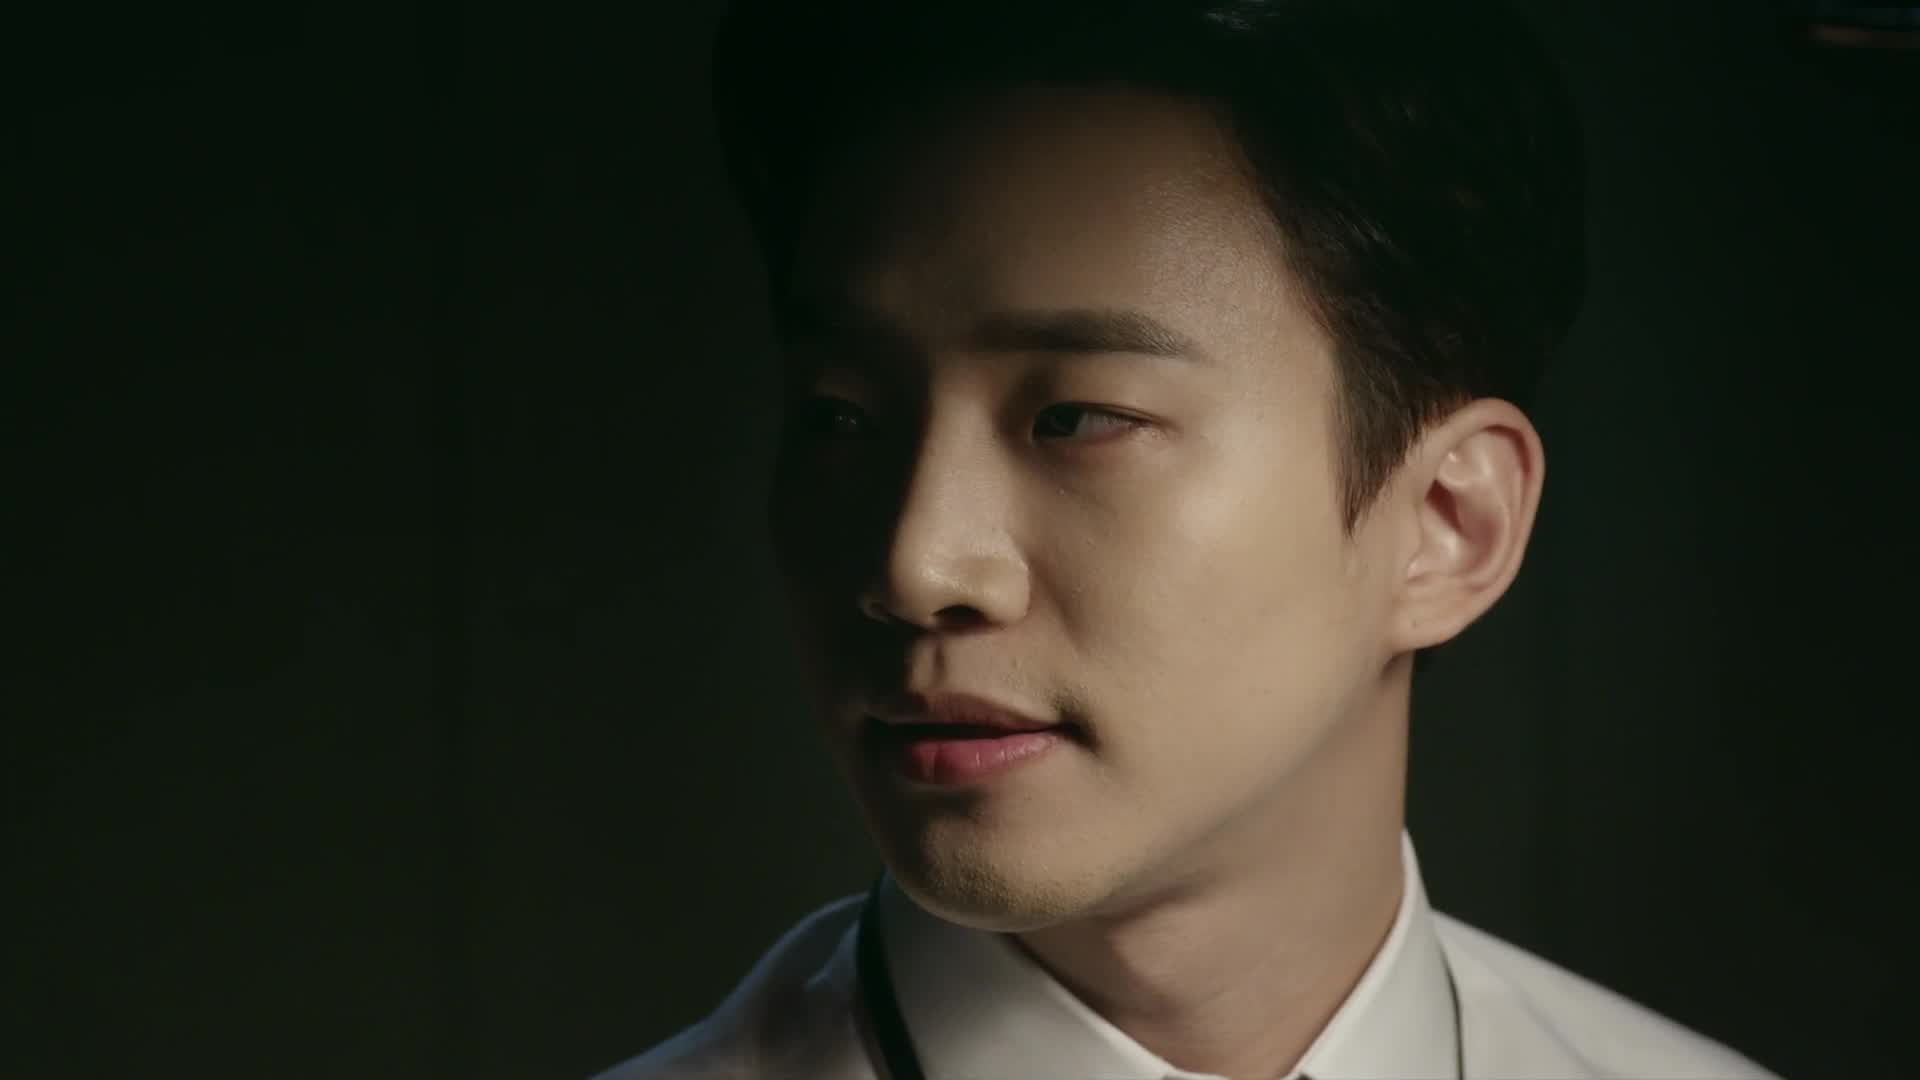 Trailer 2: Chief Kim